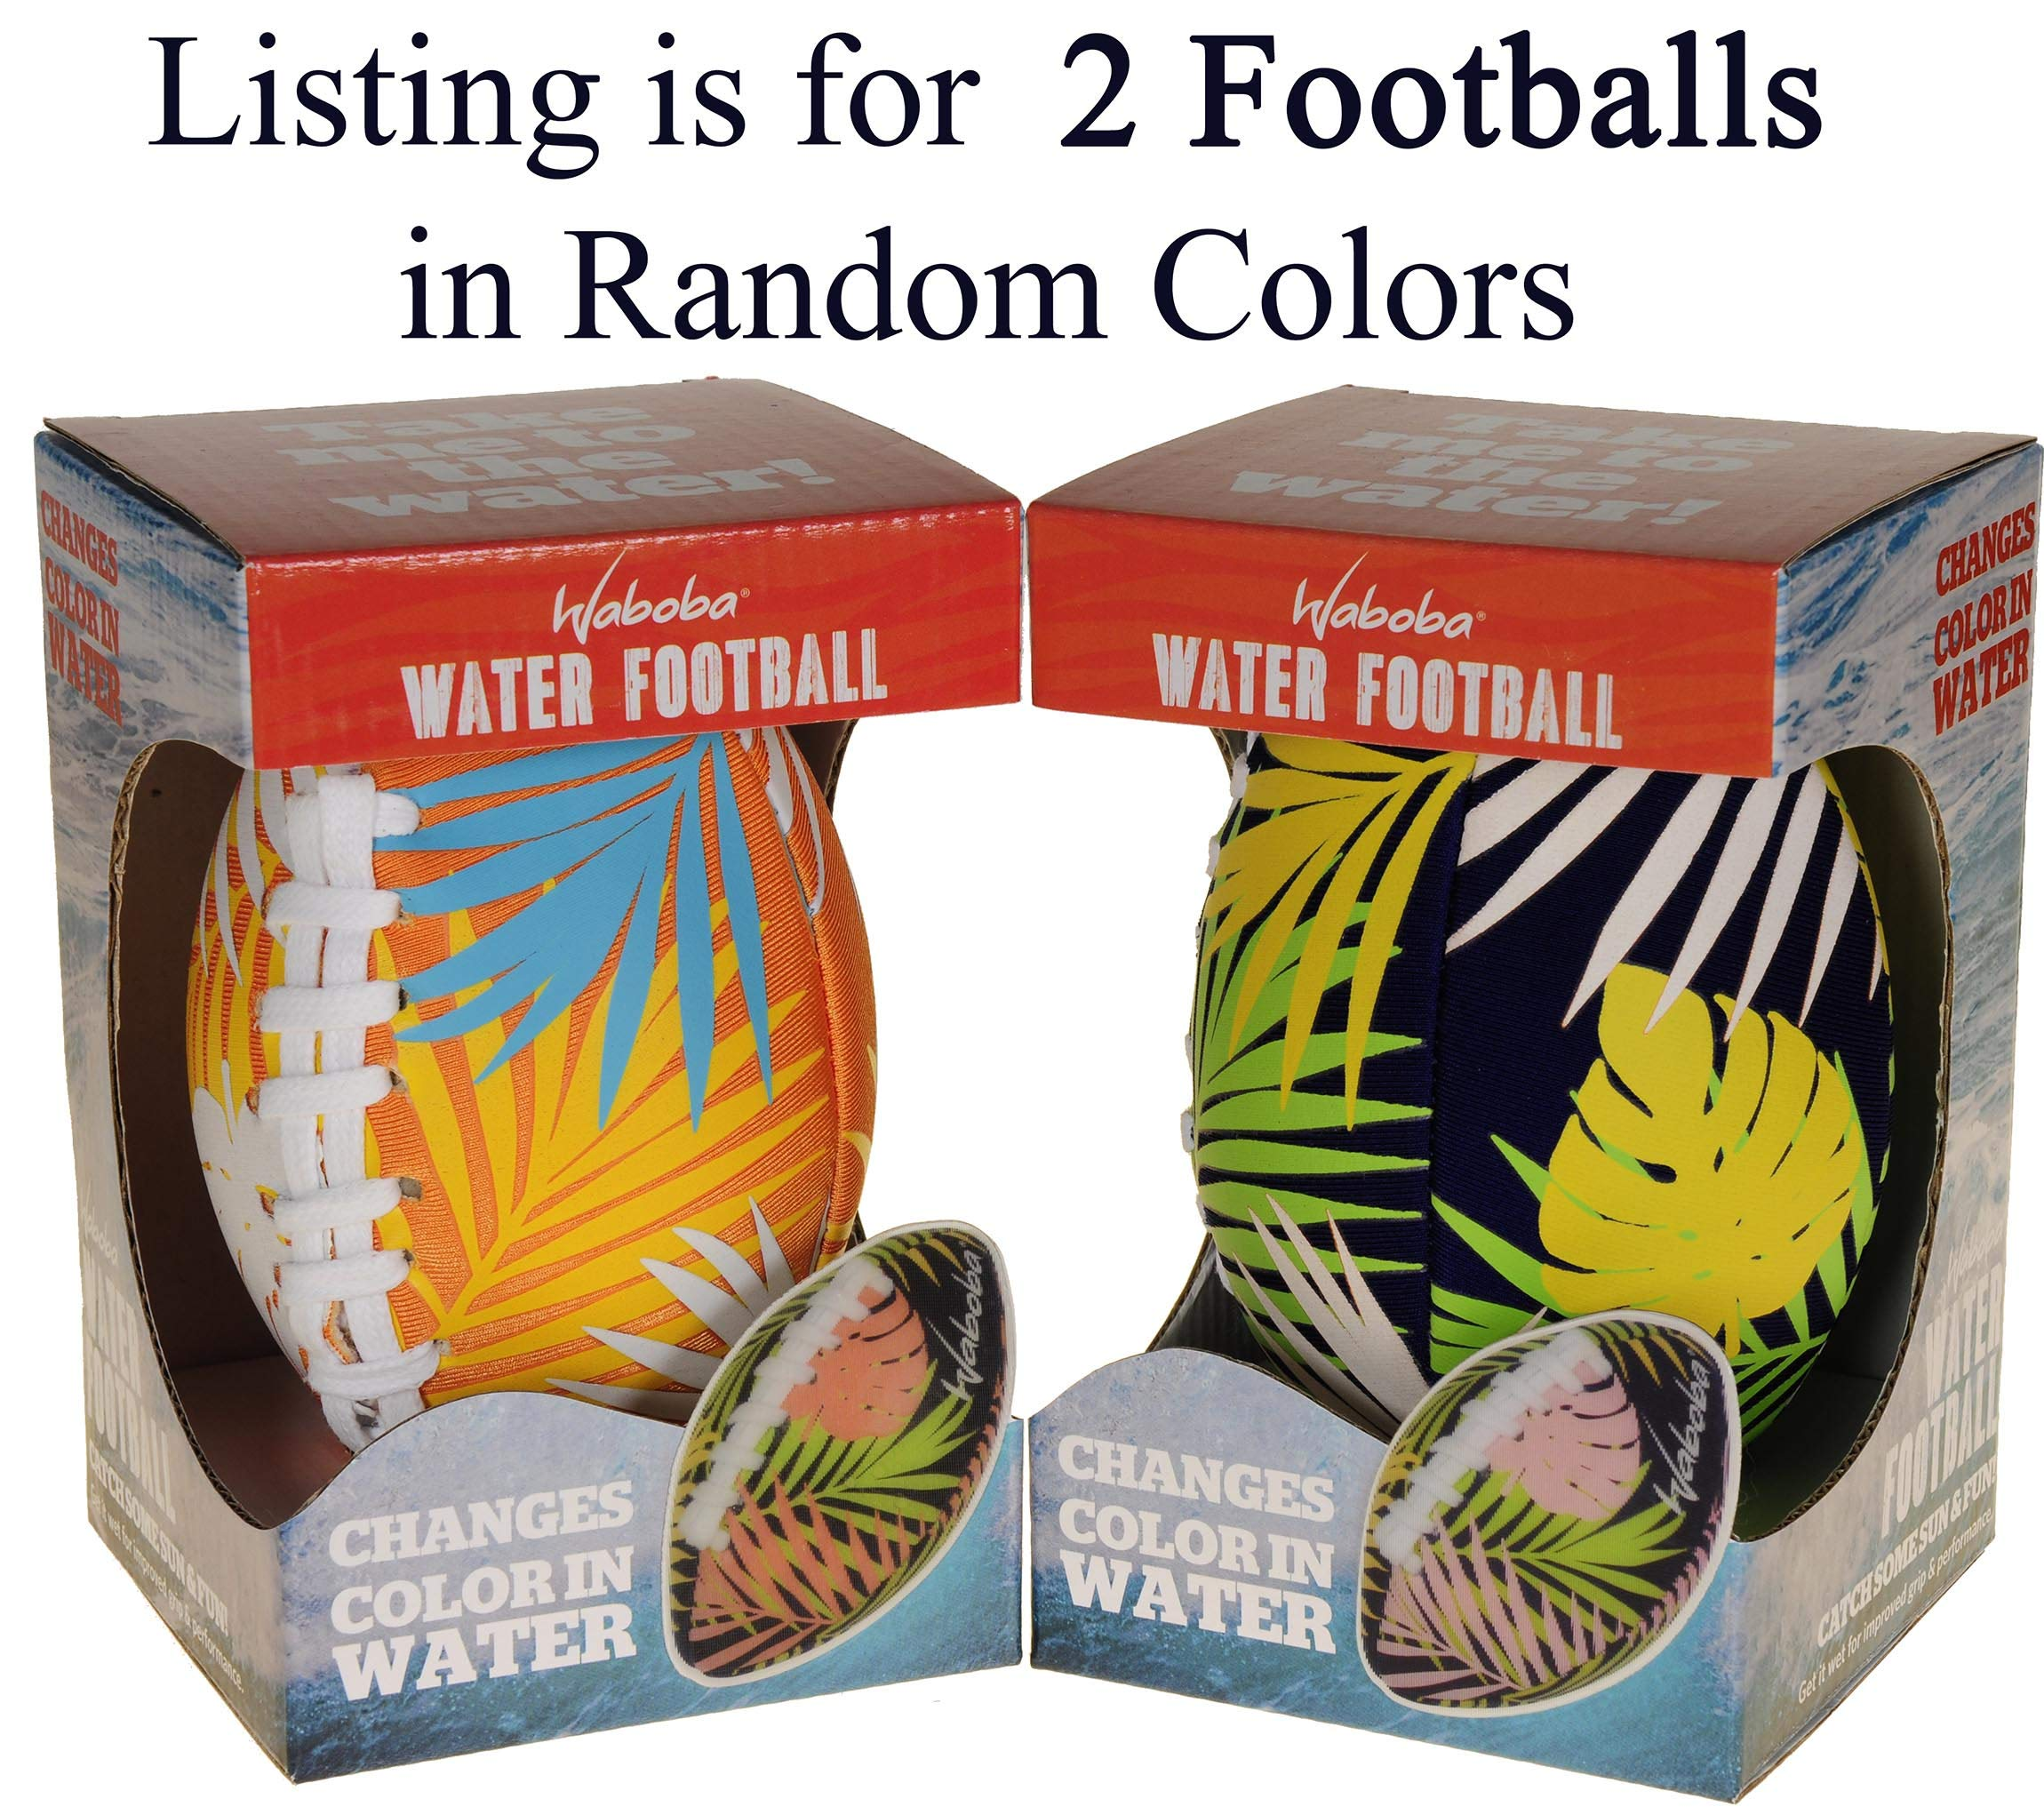 Waboba Color Changing Water Football 6'' // Bundle of 2 Footballs (Random Colors) // Bonus Blue Nylon Mesh Carry Bag// Bundled Items by Waboba (Image #1)